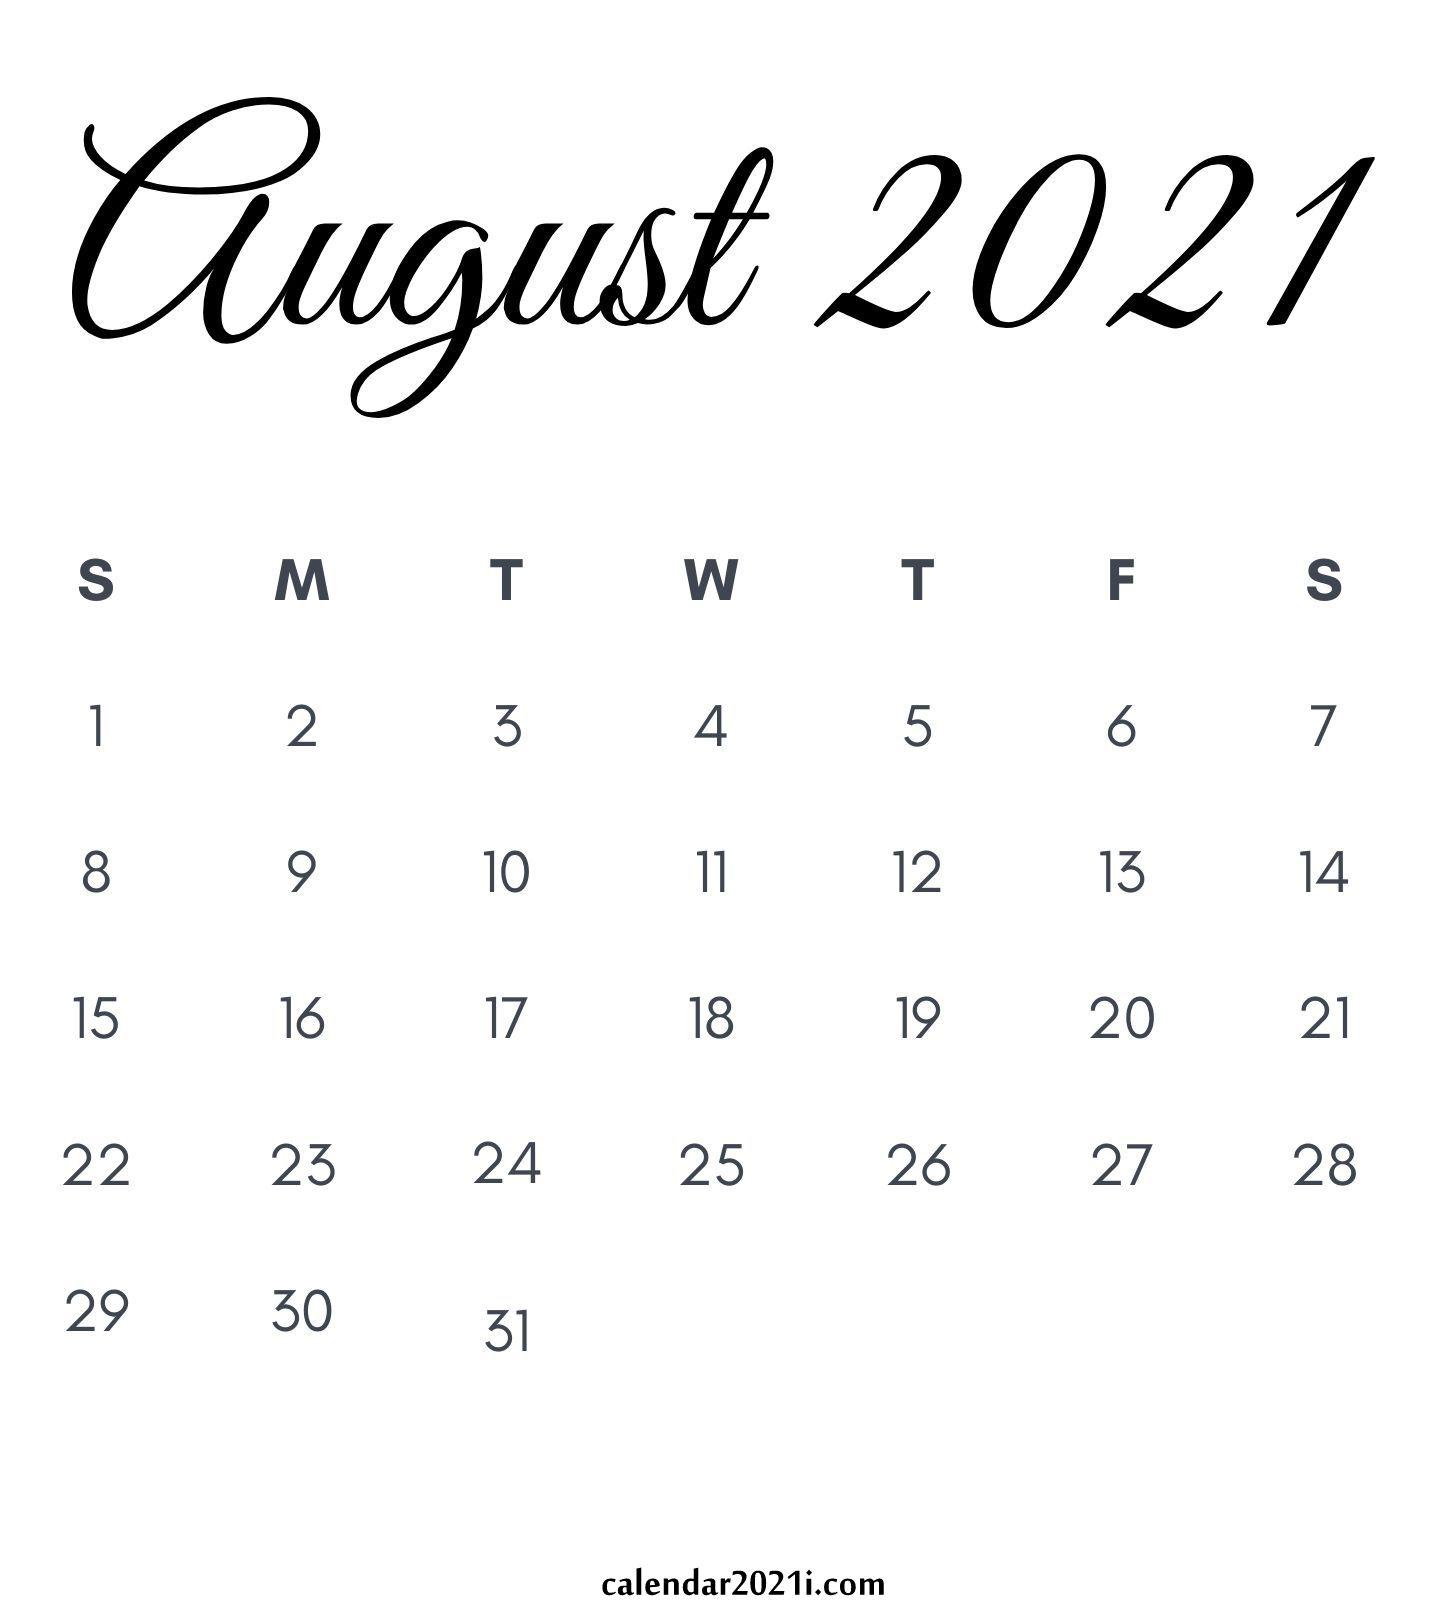 2021 Calendar Monthly Printable | Calendar 2021 inside 2021 W-4 Form Printable